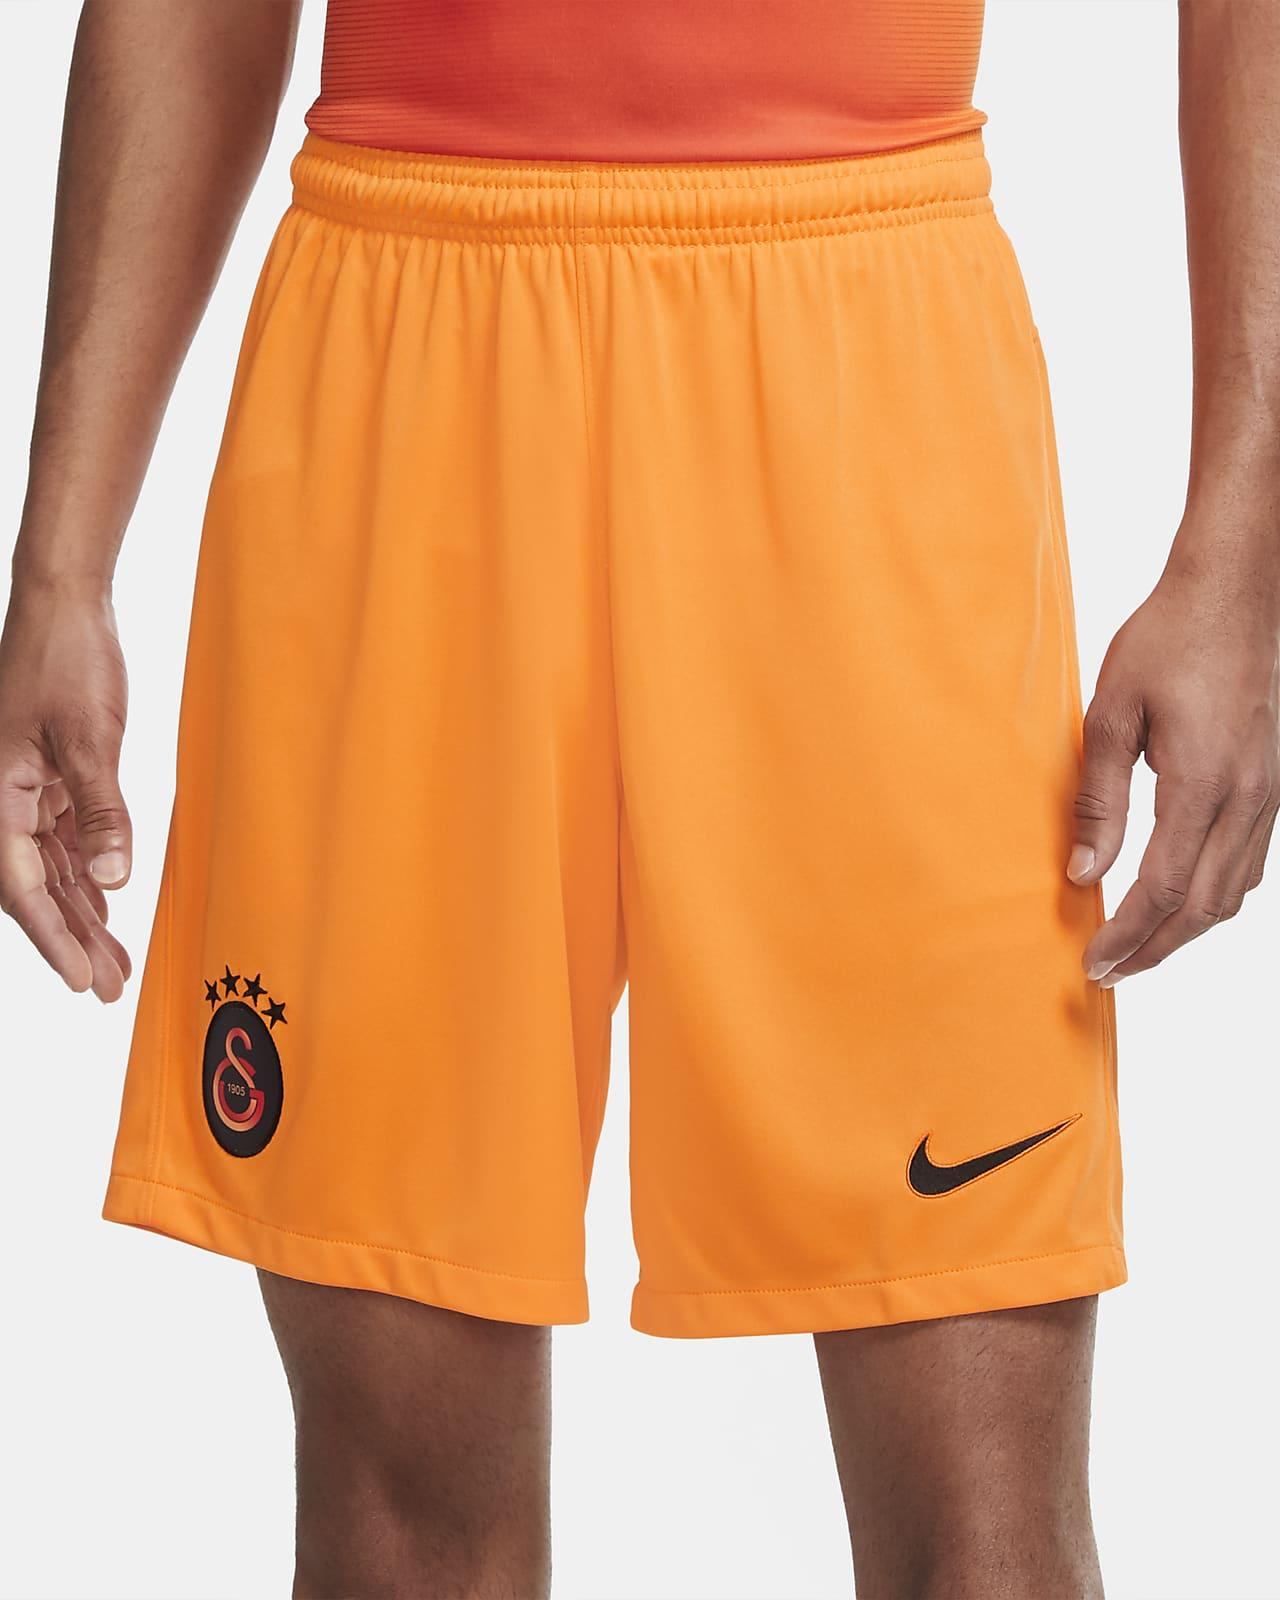 Shorts de fútbol para hombre Galatasaray 2020/21 Stadium alternativos